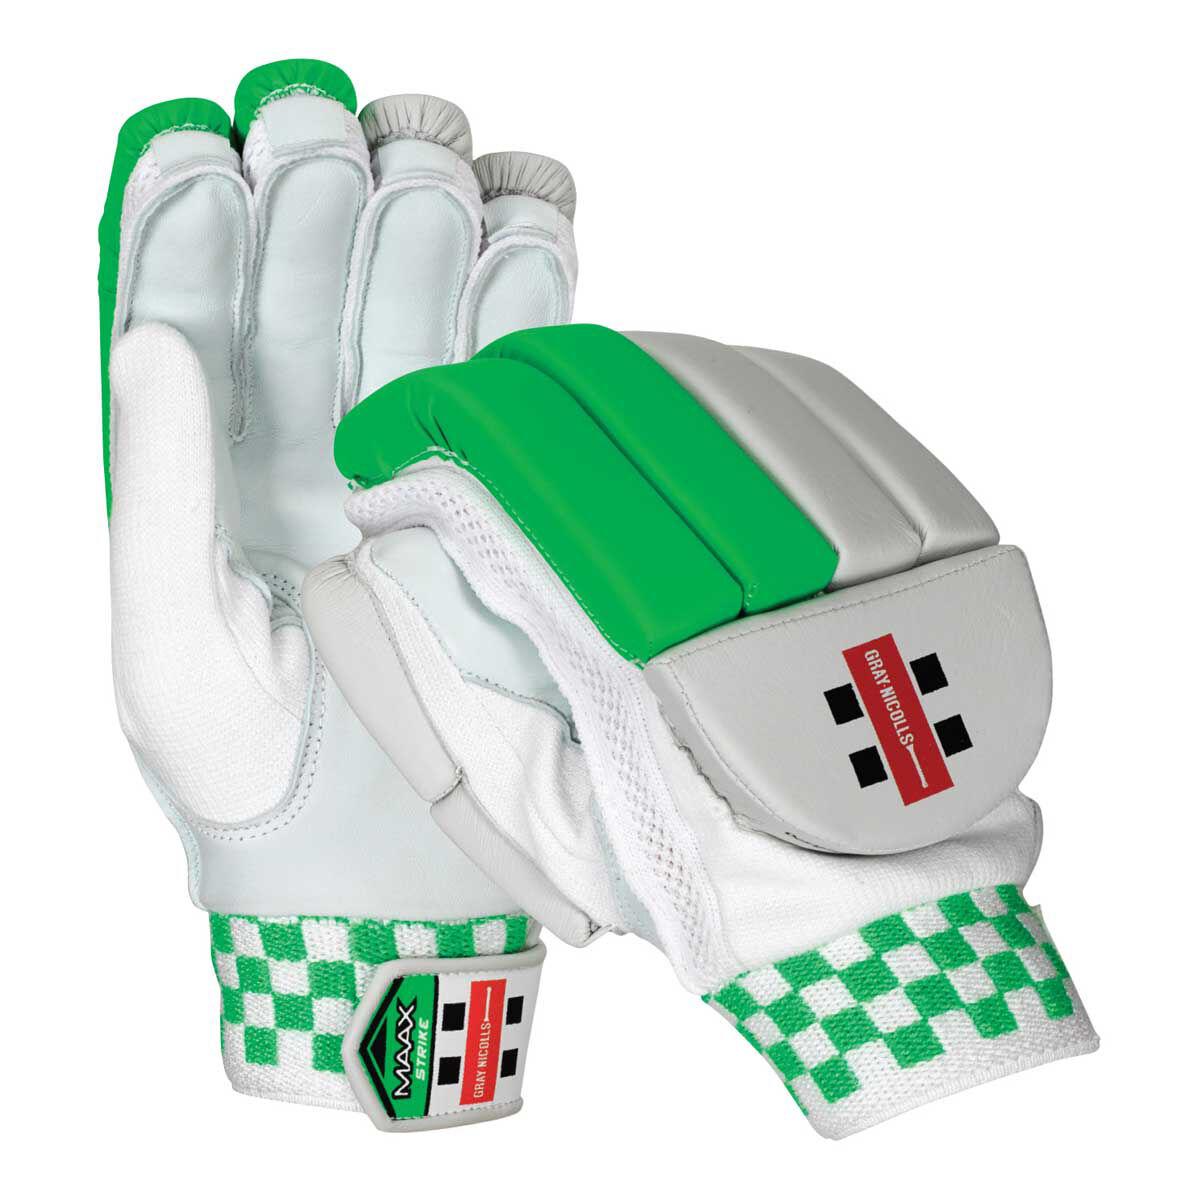 tenis mizuno strike n gloves